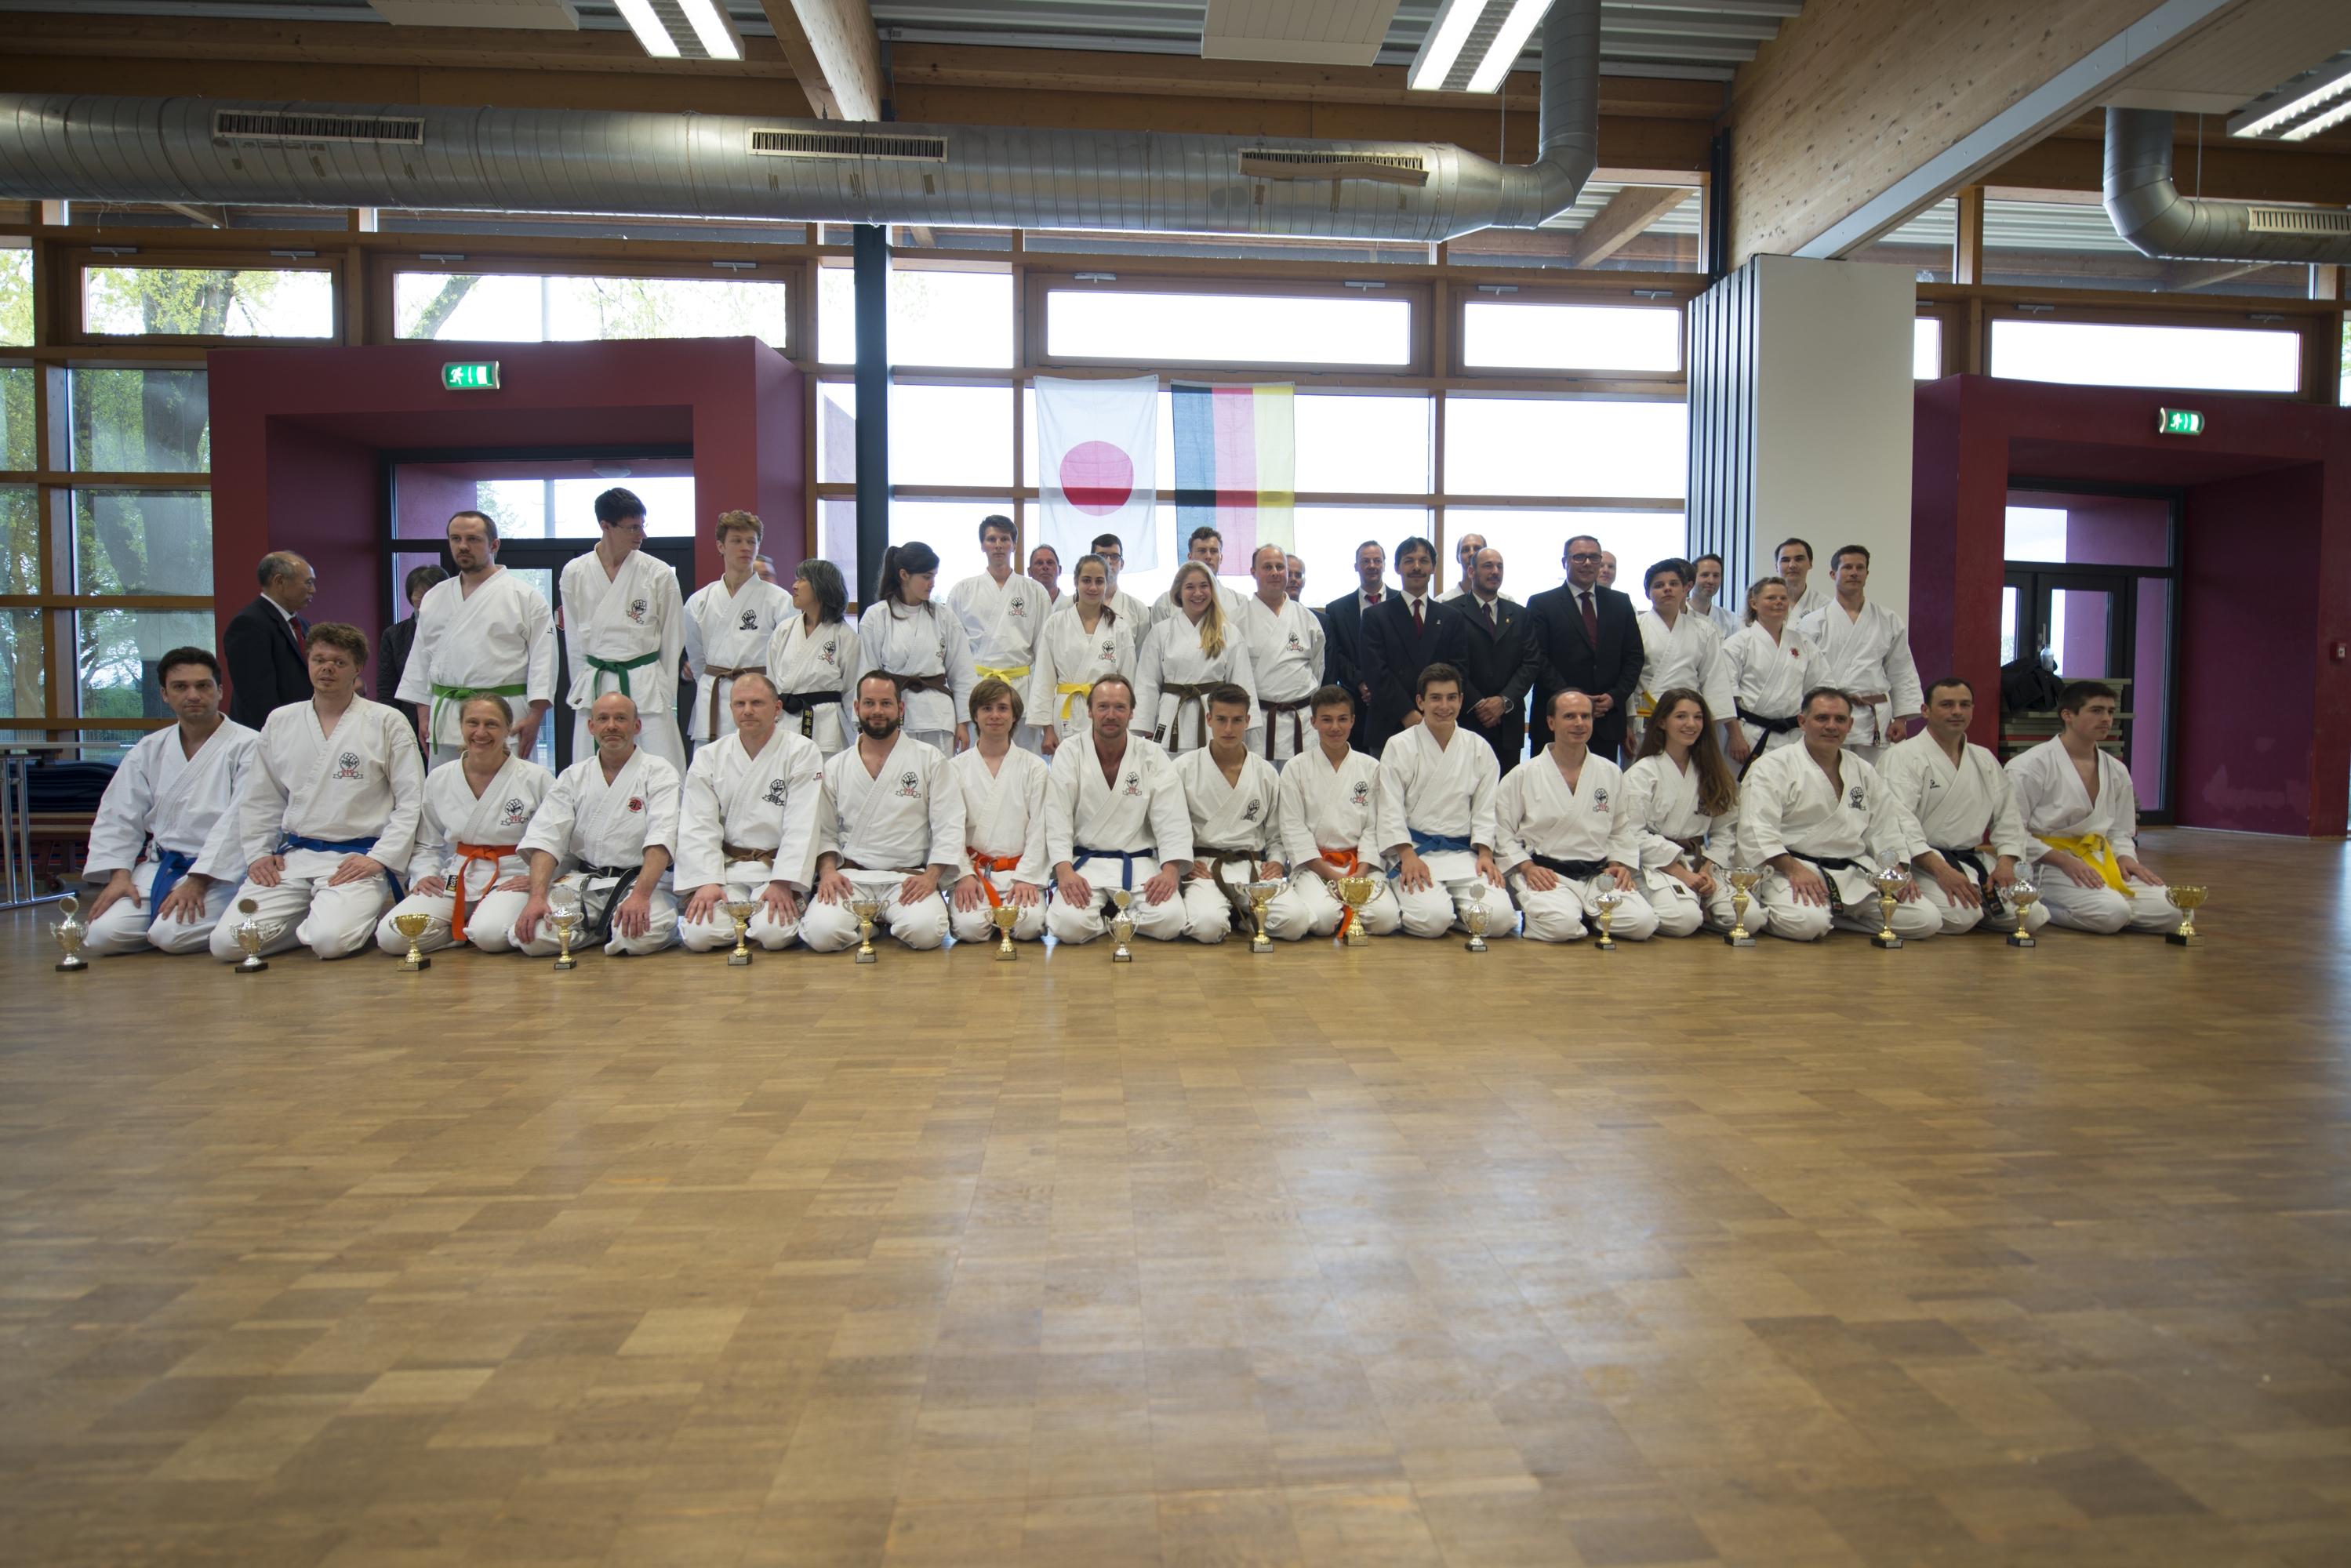 2016-04-26 Kata Turnier Kaarst 360